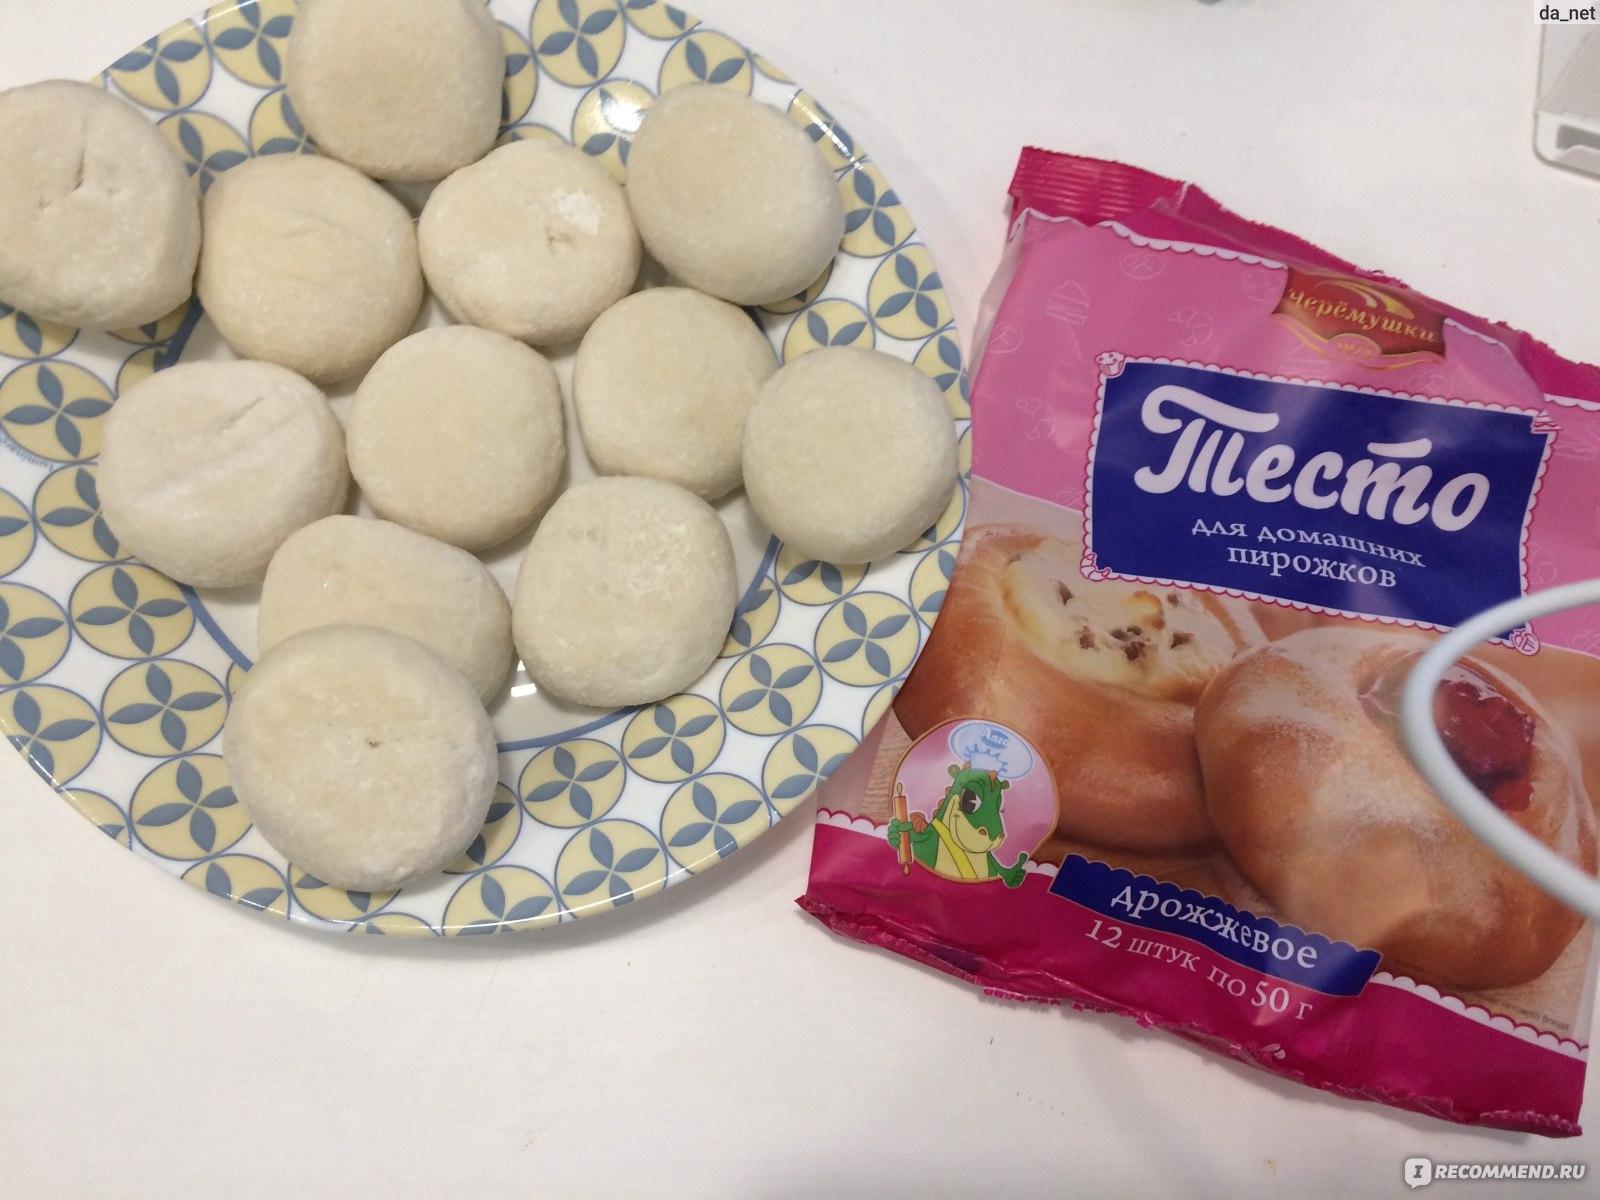 Тесто черемушки для пирожков рецепт с фото